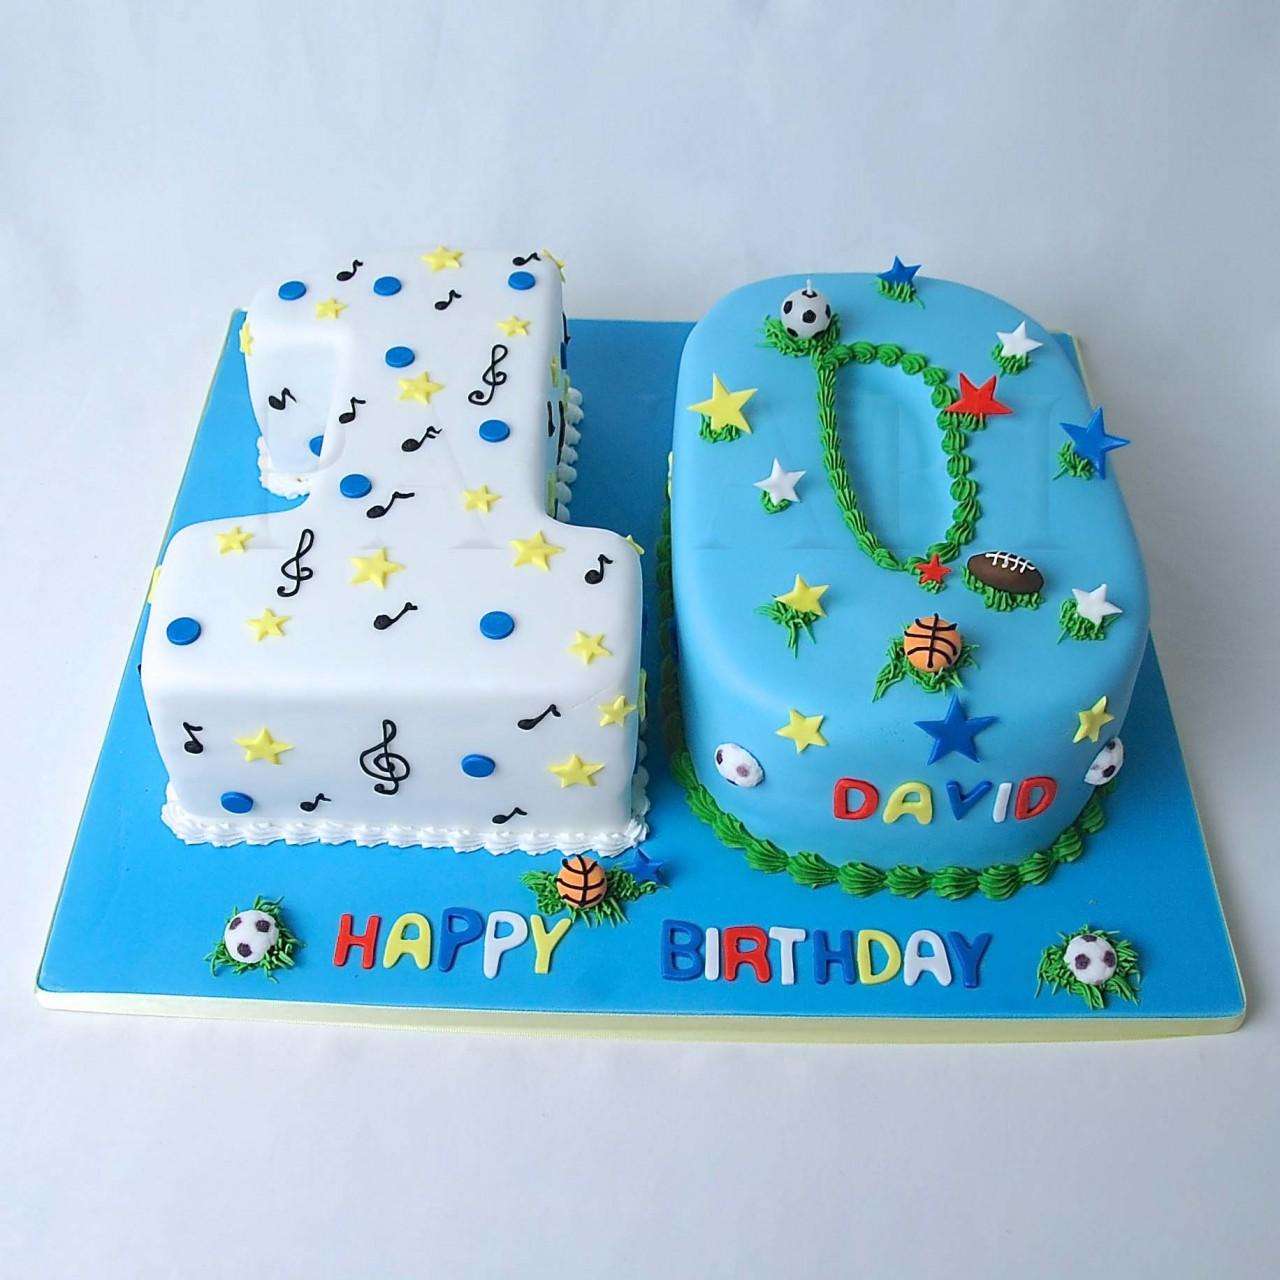 11 10th Birthday Cakes For Boys Photo Girls 10th Birthday Cake